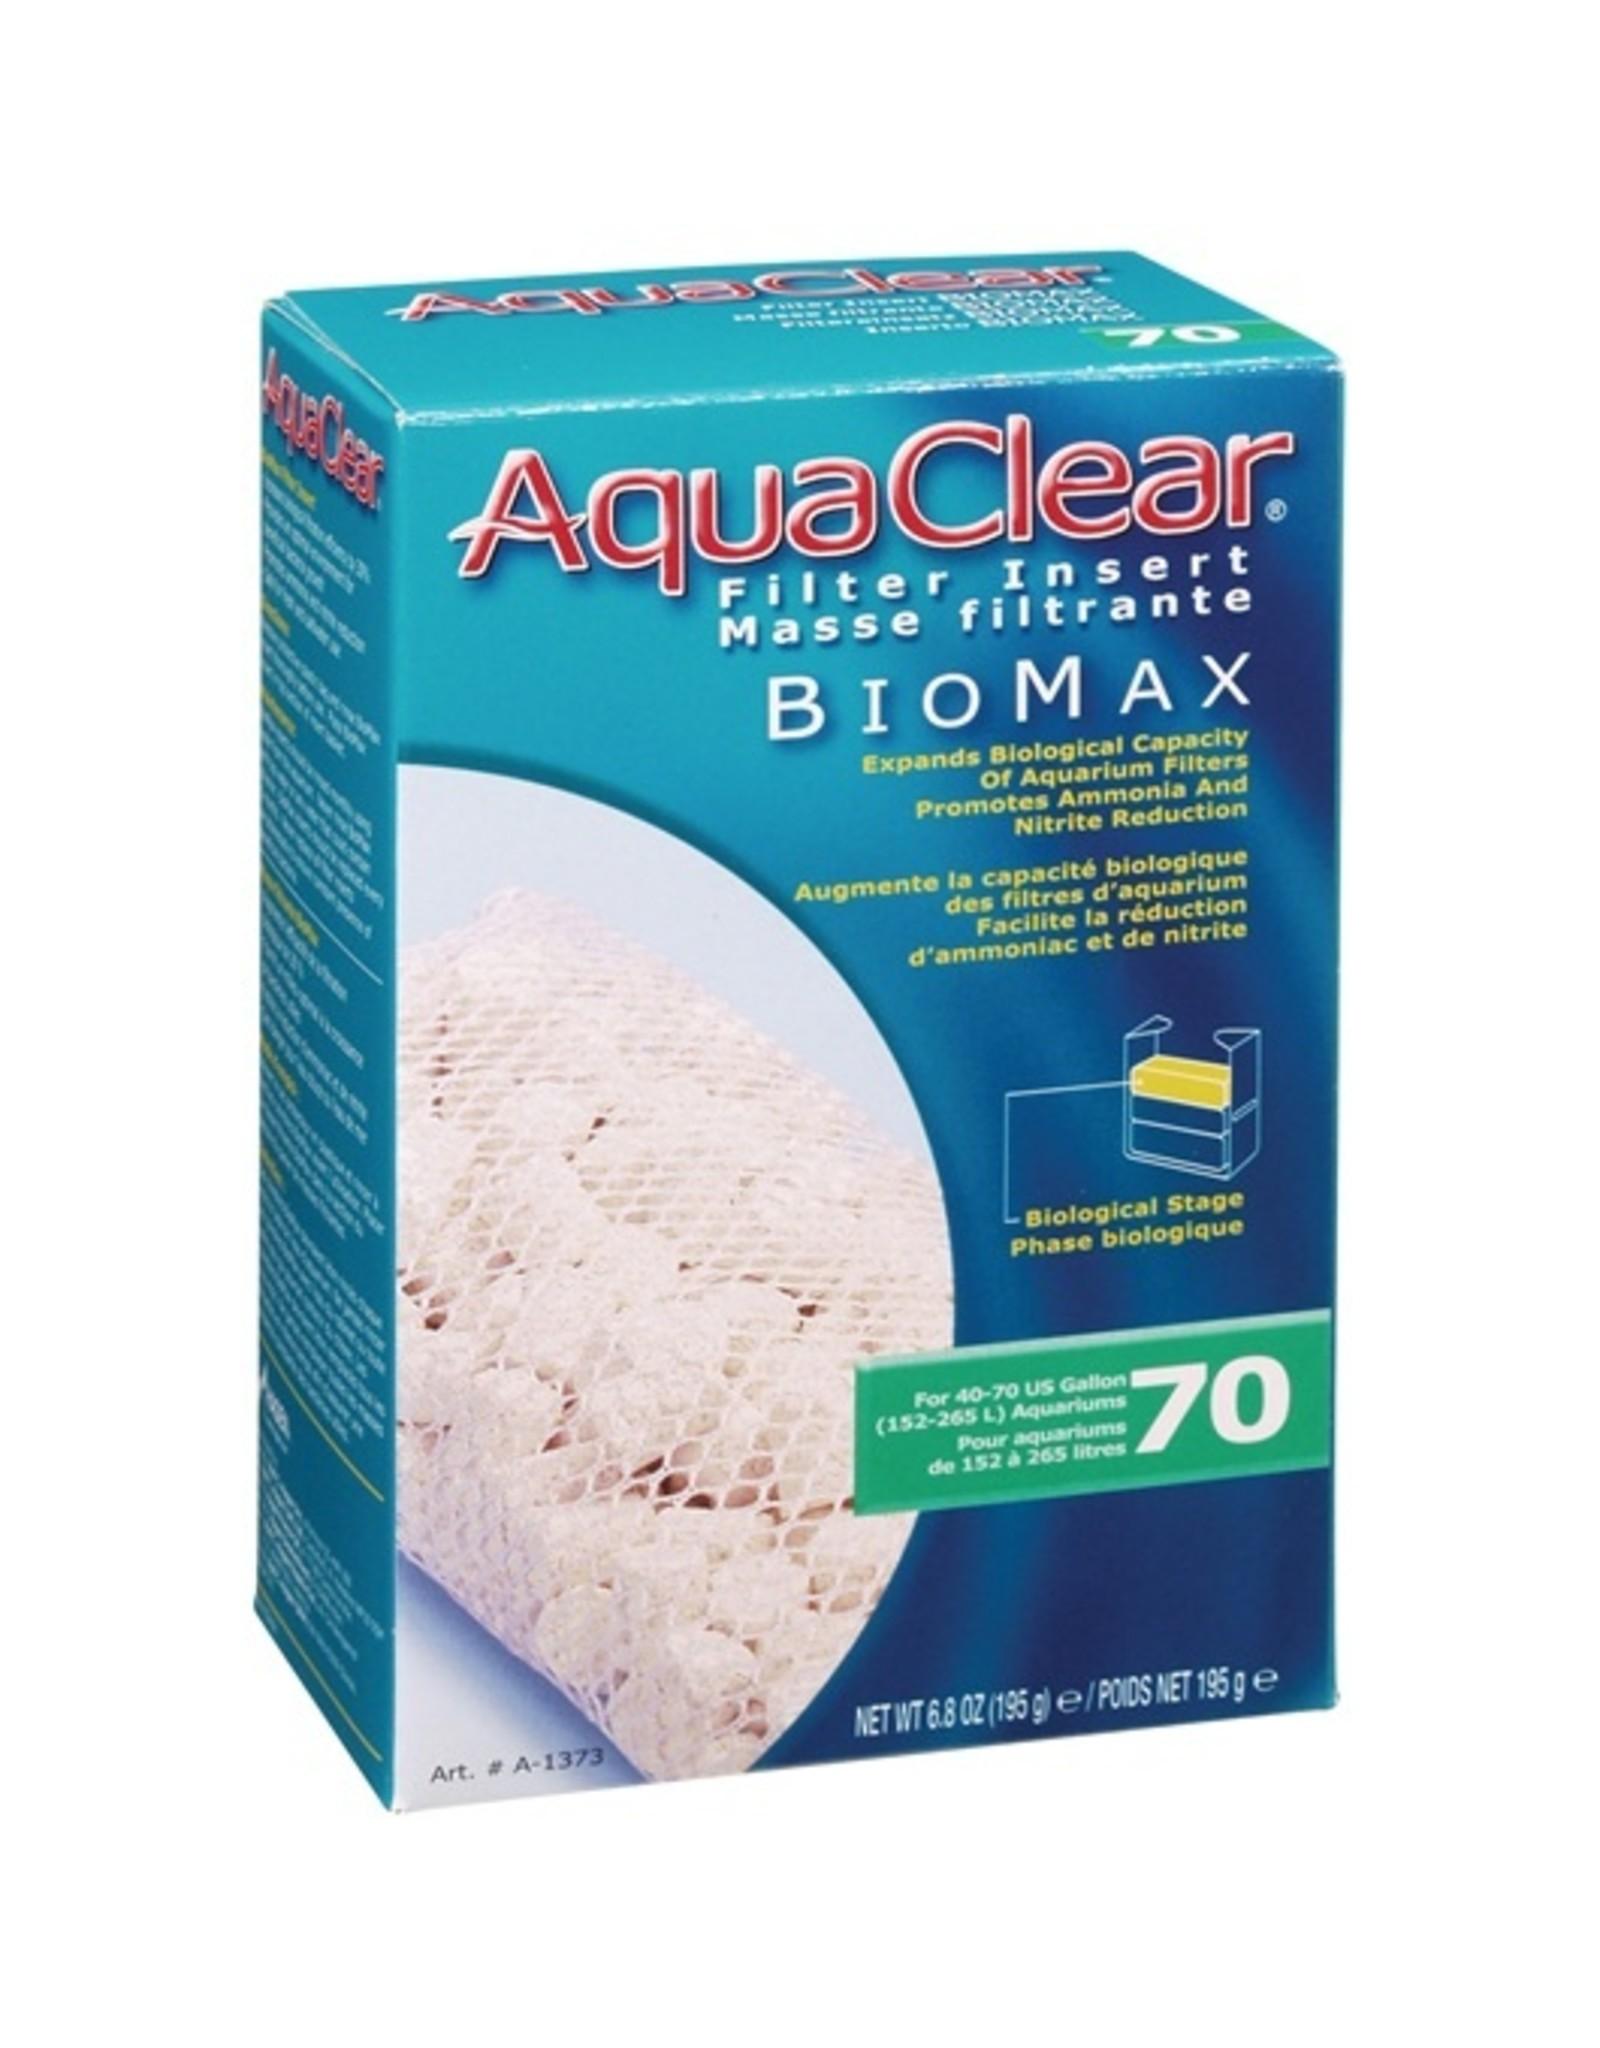 Aquaclear AQUACLEAR BioMax